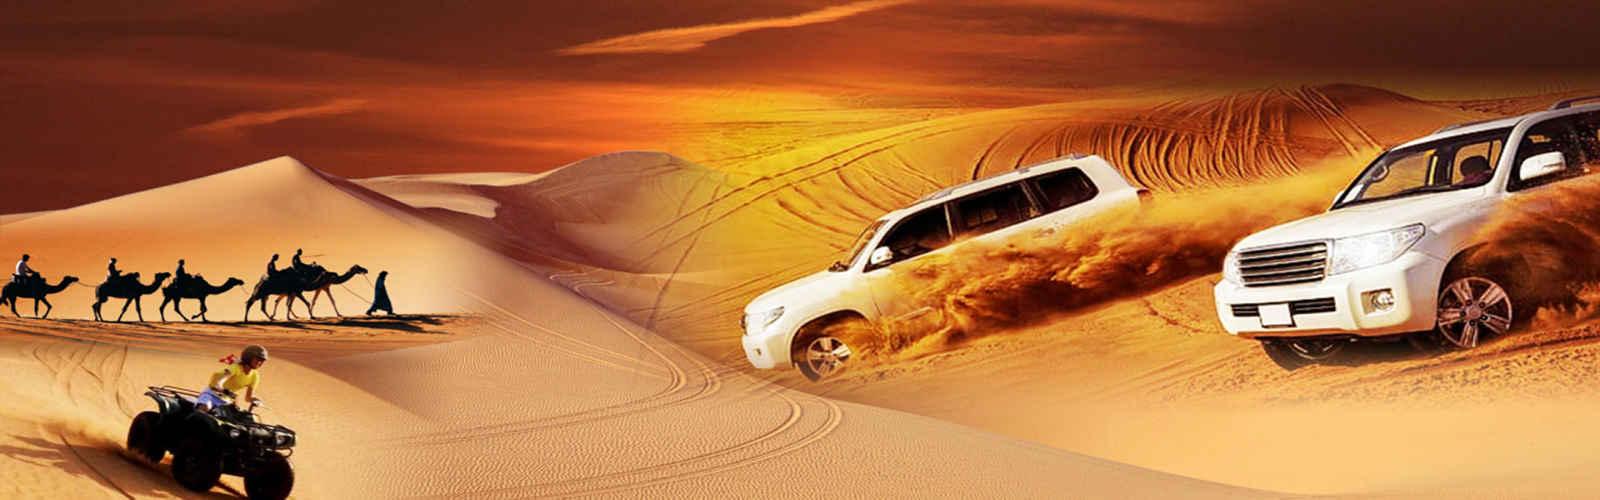 evening desert safari dubai banner